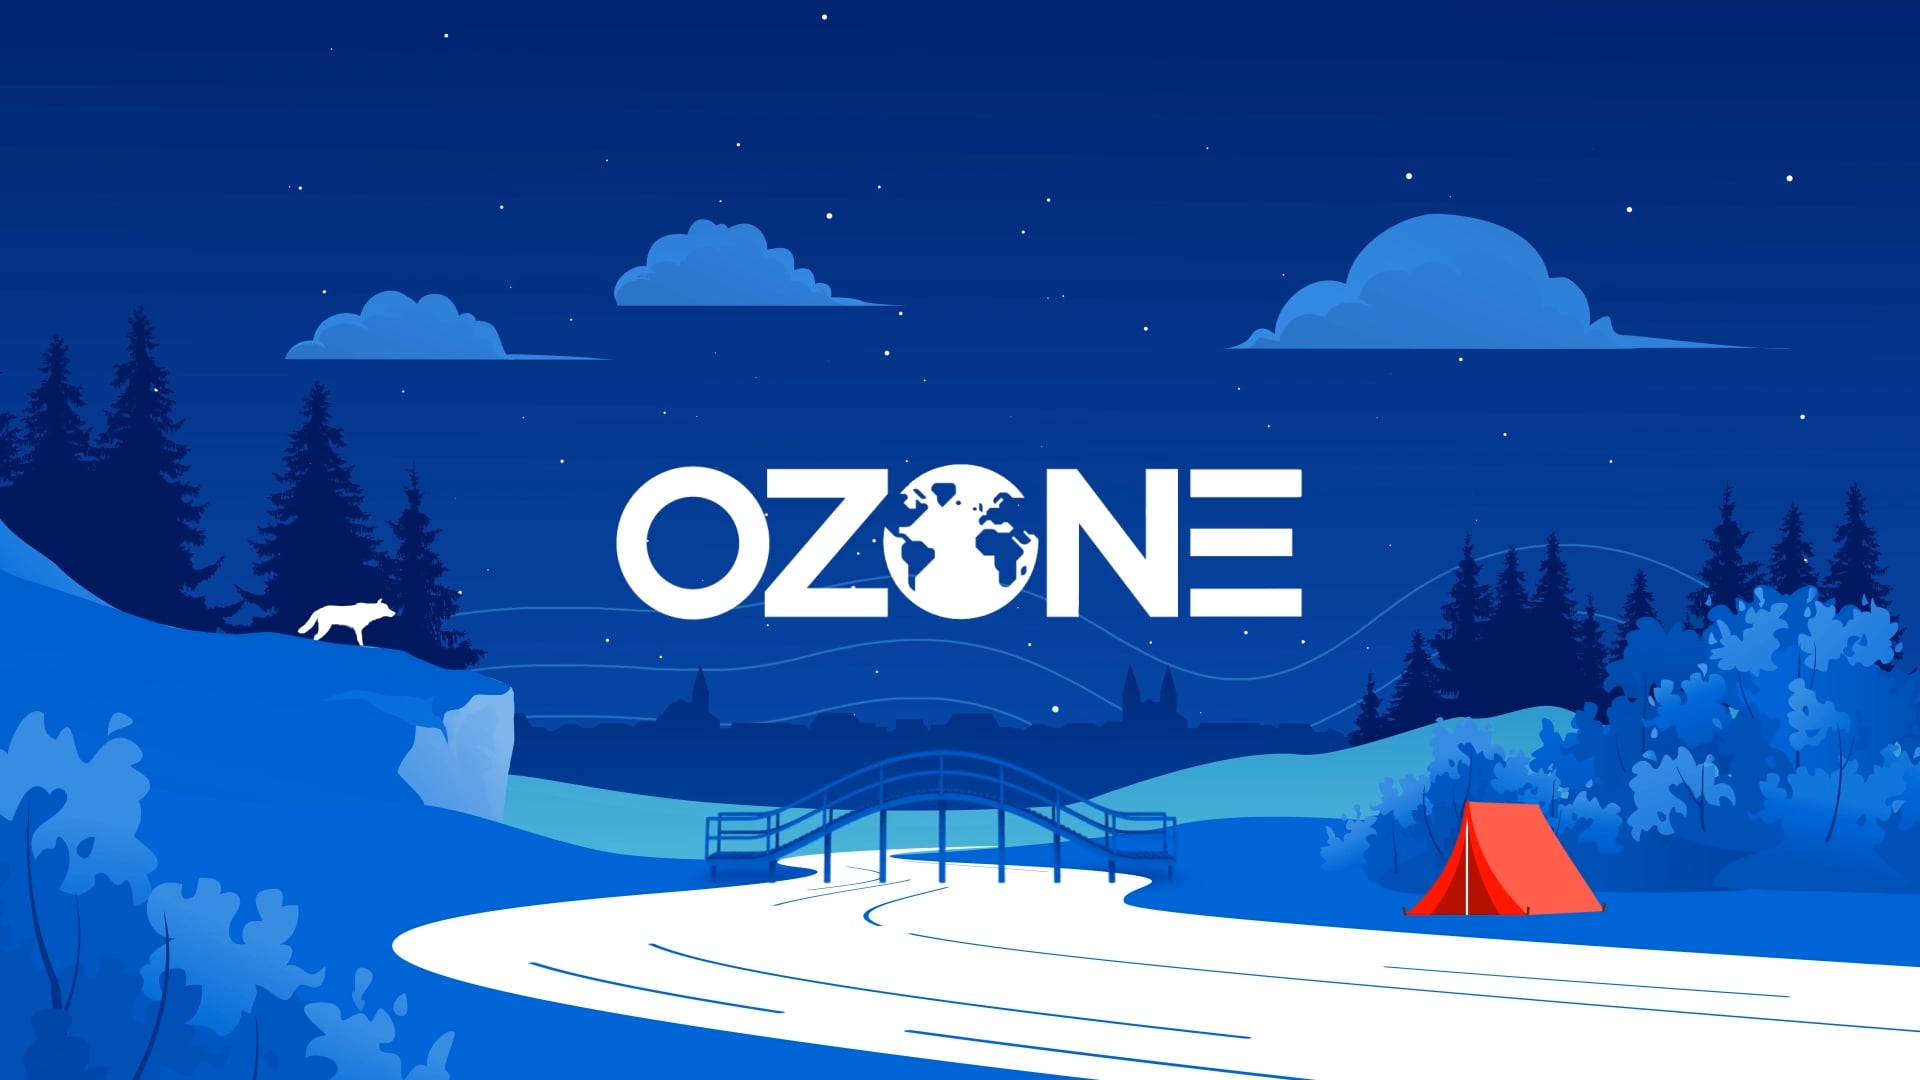 Ozone TV | channel rebranding